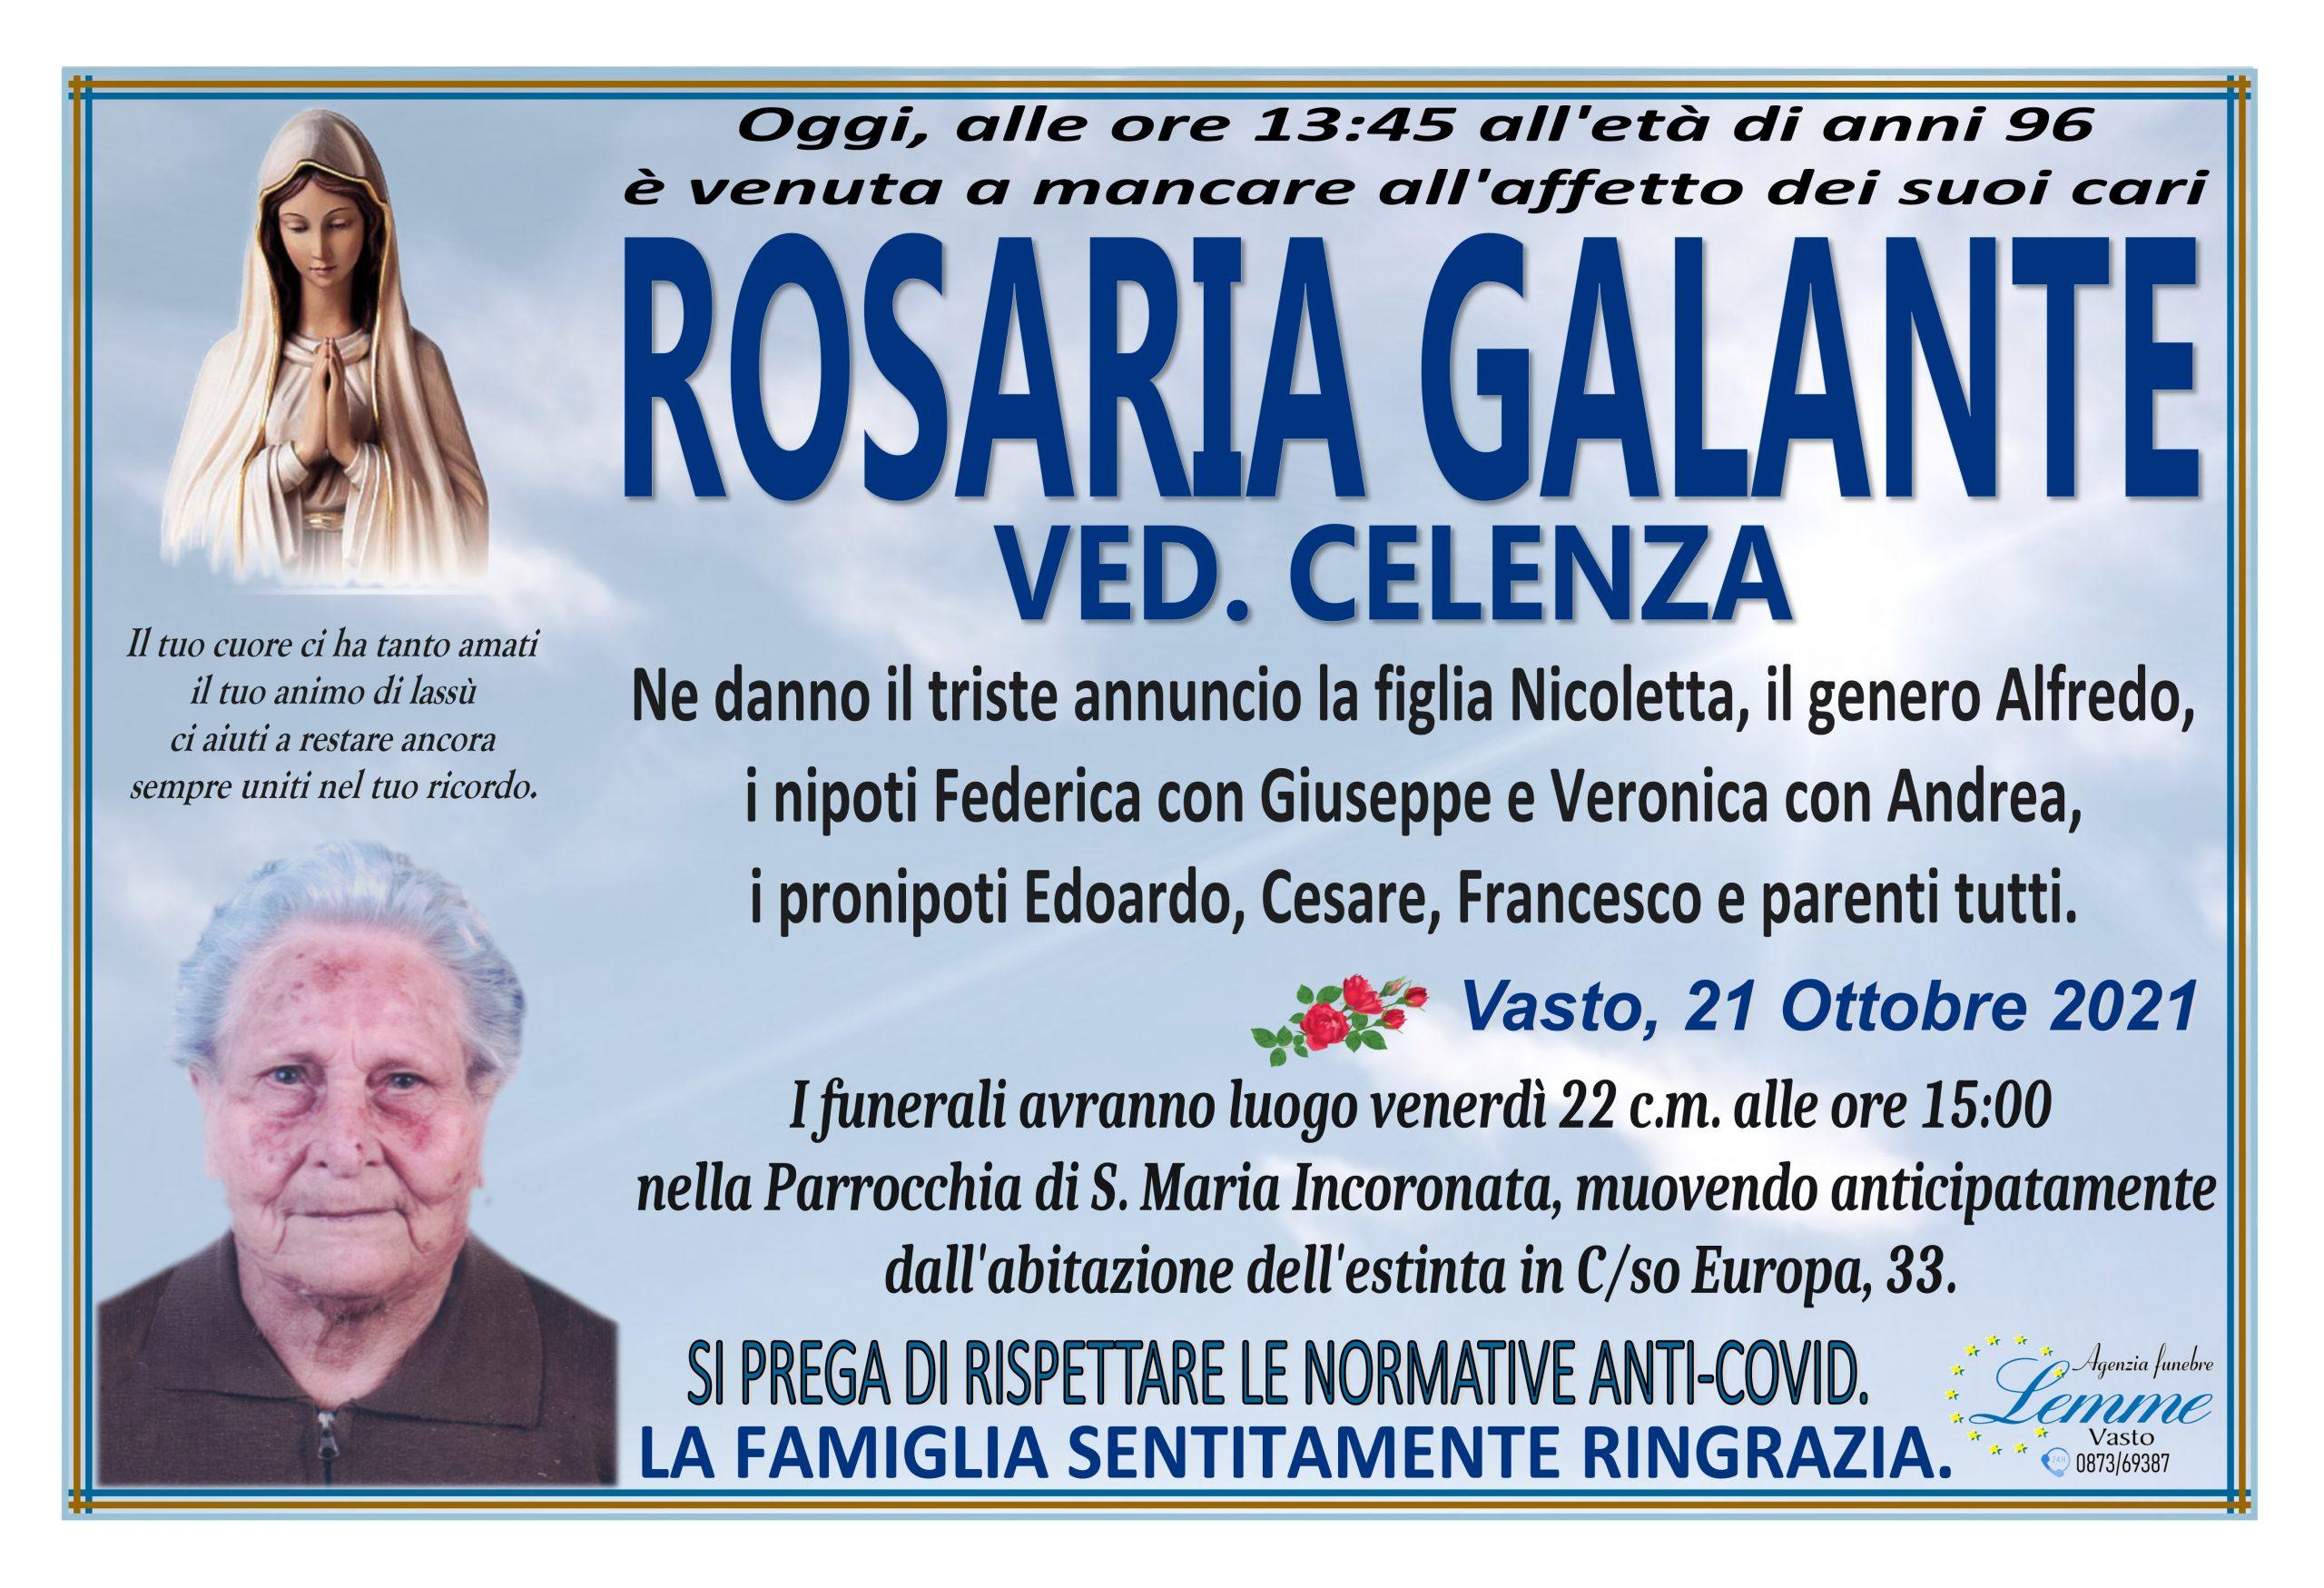 ROSARIA GALANTE